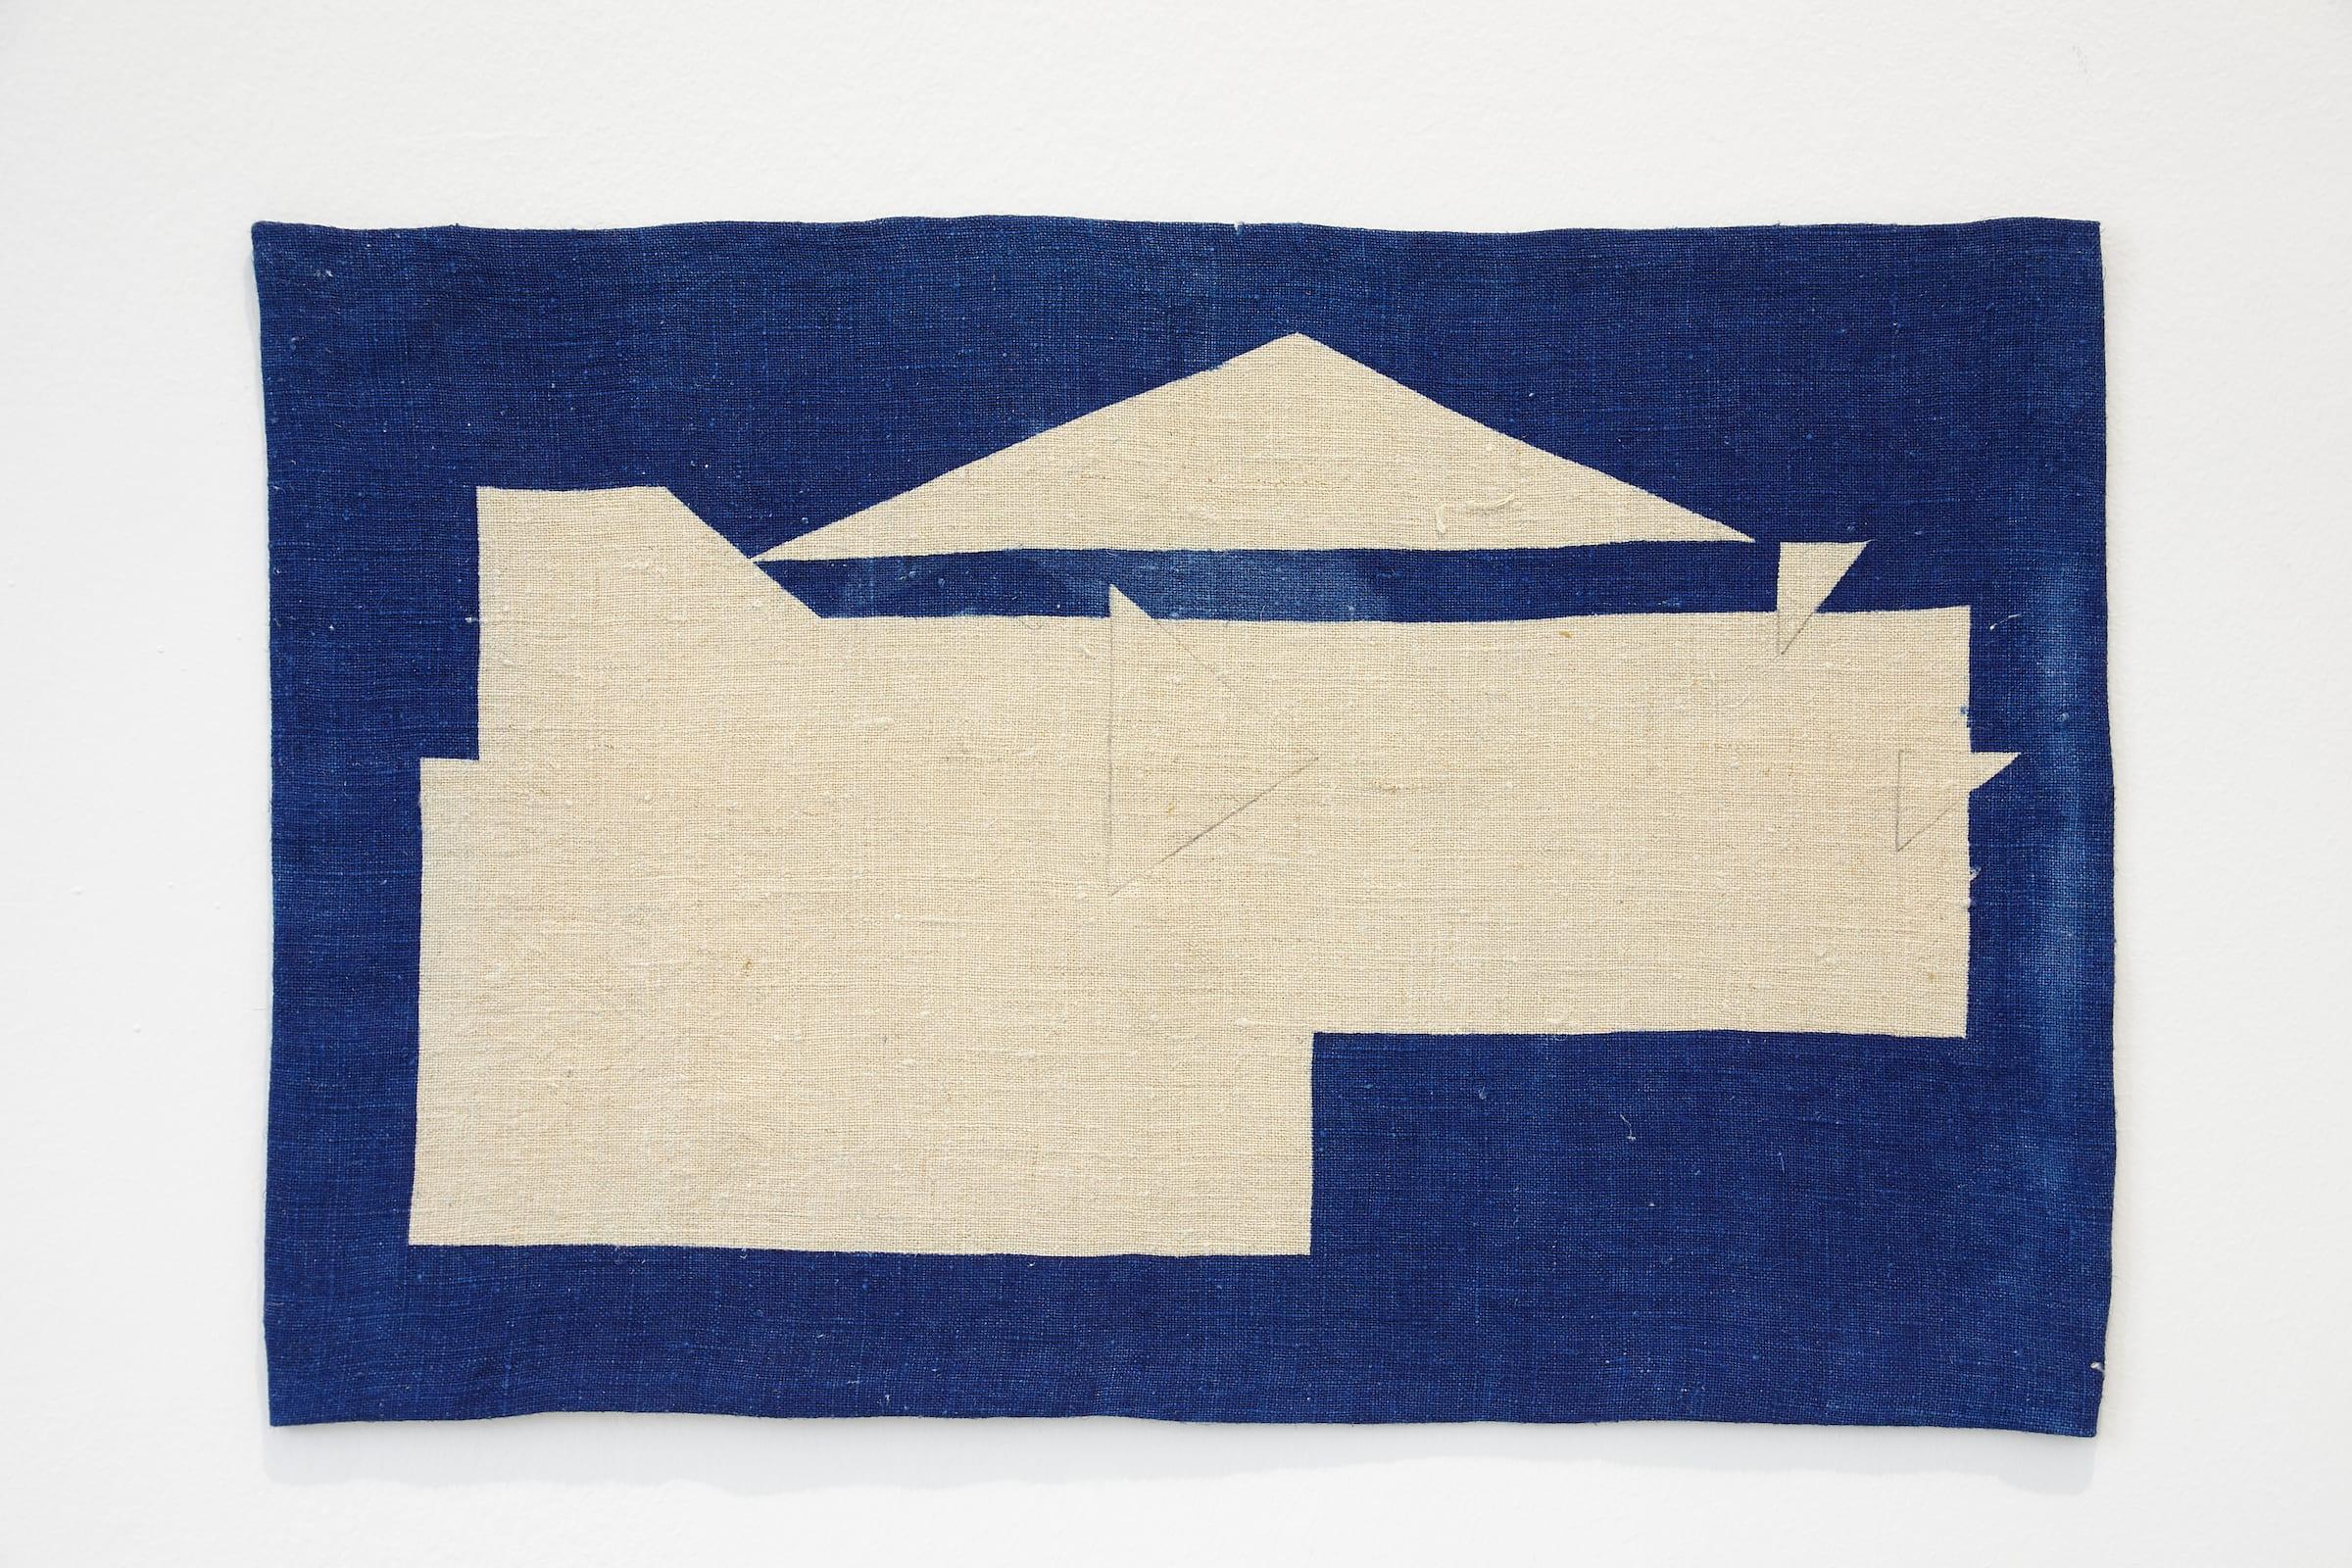 "<span class=""link fancybox-details-link""><a href=""/exhibitions/171/works/artworks8545/"">View Detail Page</a></span><div class=""artist""><strong>Kristín Jónsdóttir frá Munkaþverá</strong></div><div class=""title""><em>Landið hvíta / The White Island</em>, 1962</div><div class=""medium"">silk screen on linen / sáldþrykk á hör</div><div class=""dimensions"">37 x 57 cm</div>"